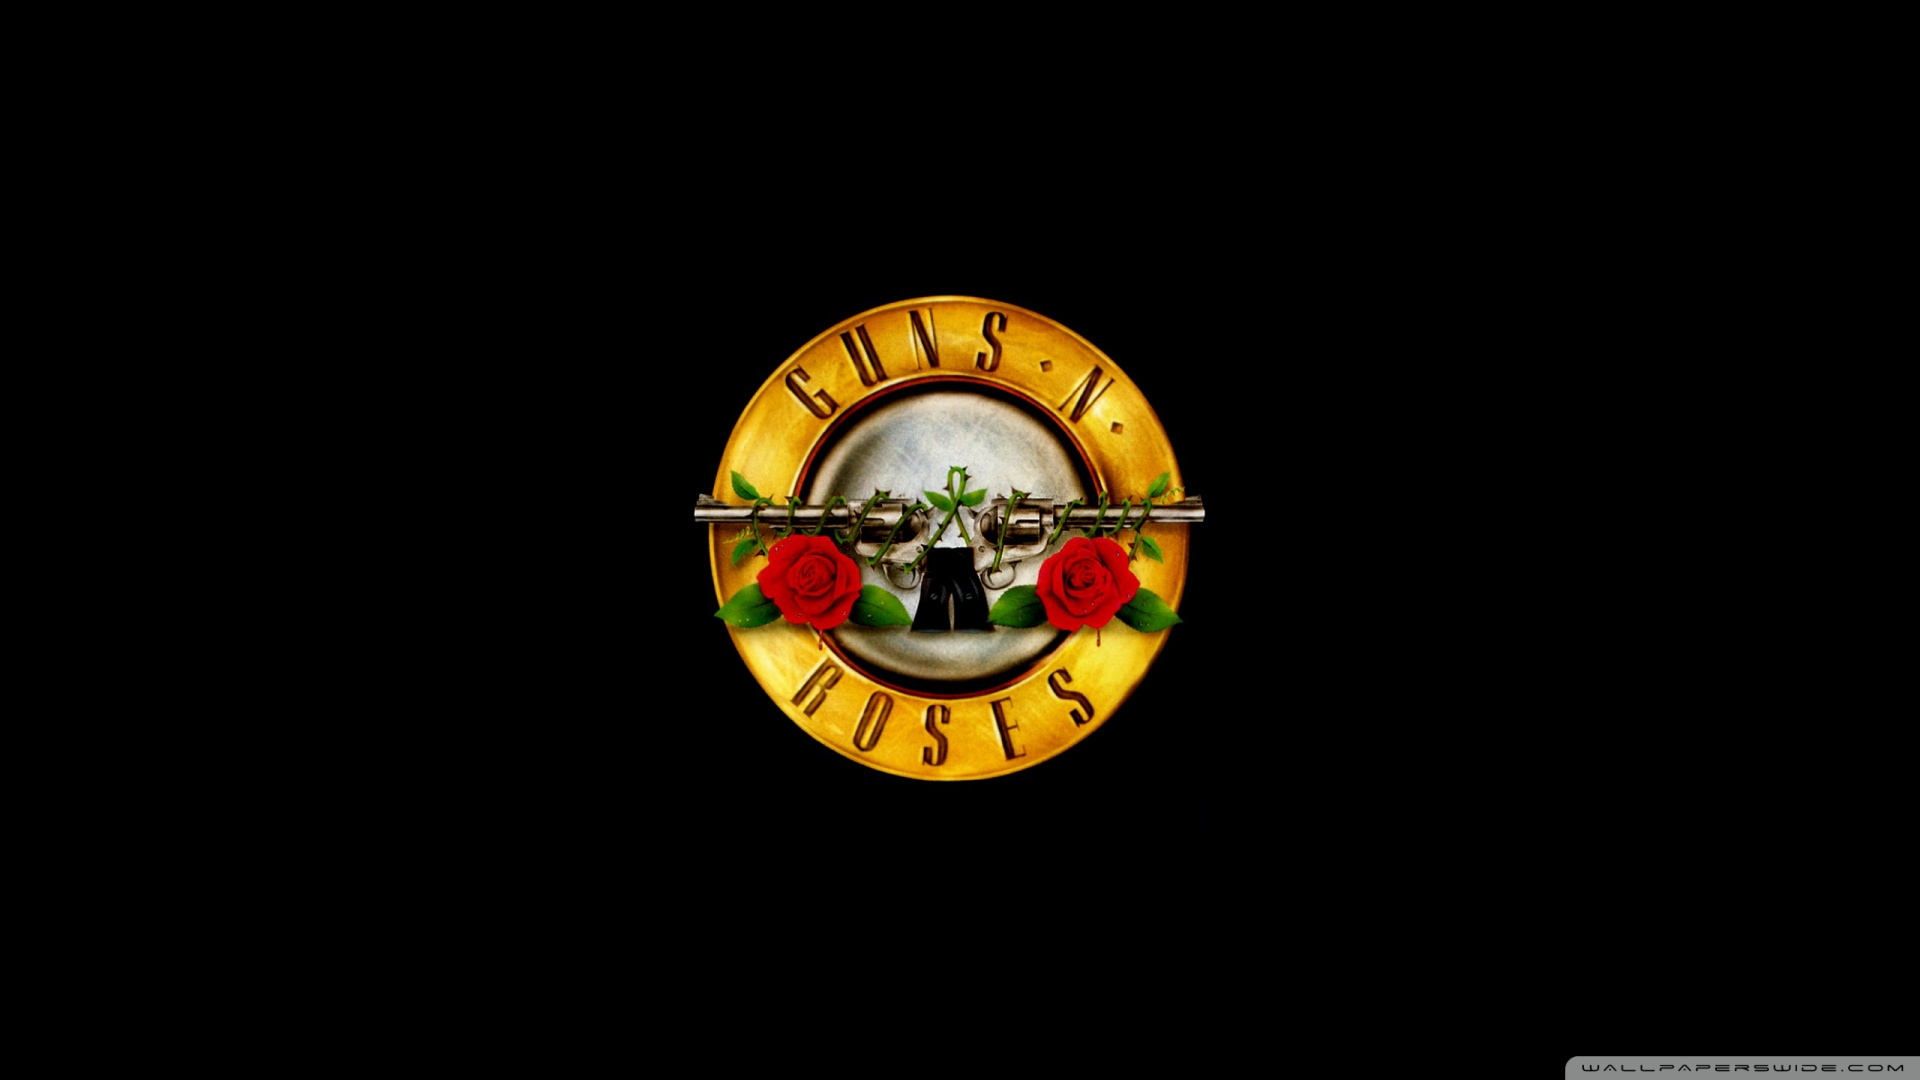 Guns N Roses Logo Hd Wallpaper 1920x1080 Guns N Roses Logo Hd 1920x1080